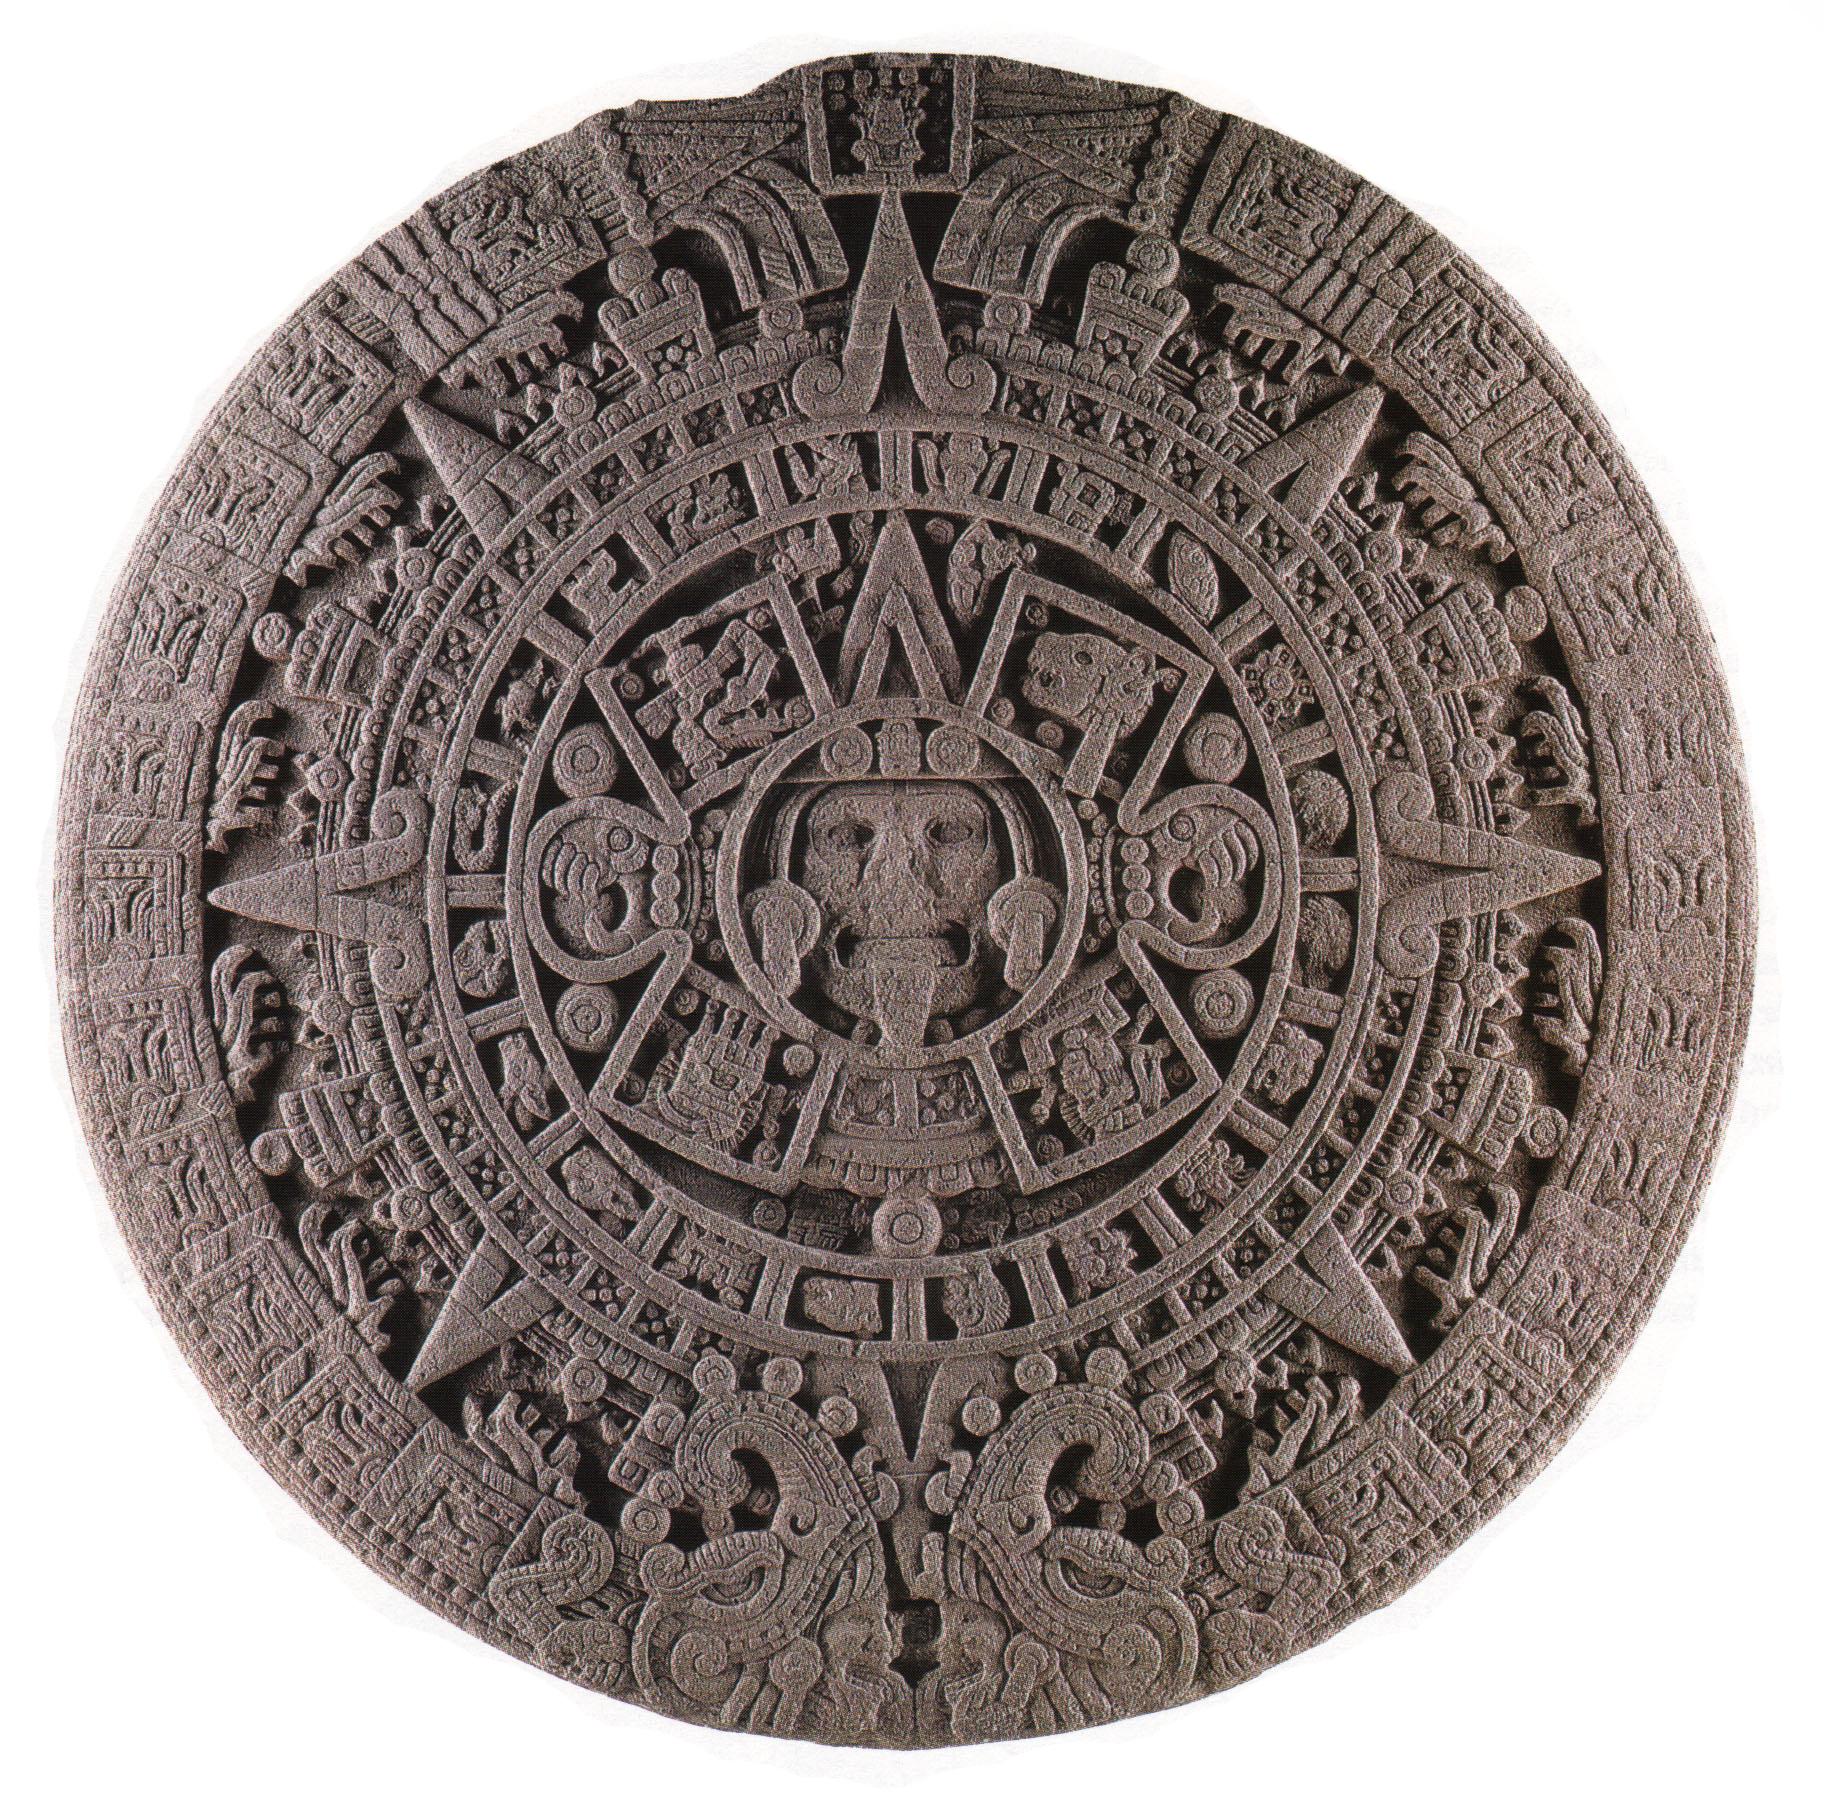 1824x1794 The Face Of The Calendar Stone A New Interpretation Maya